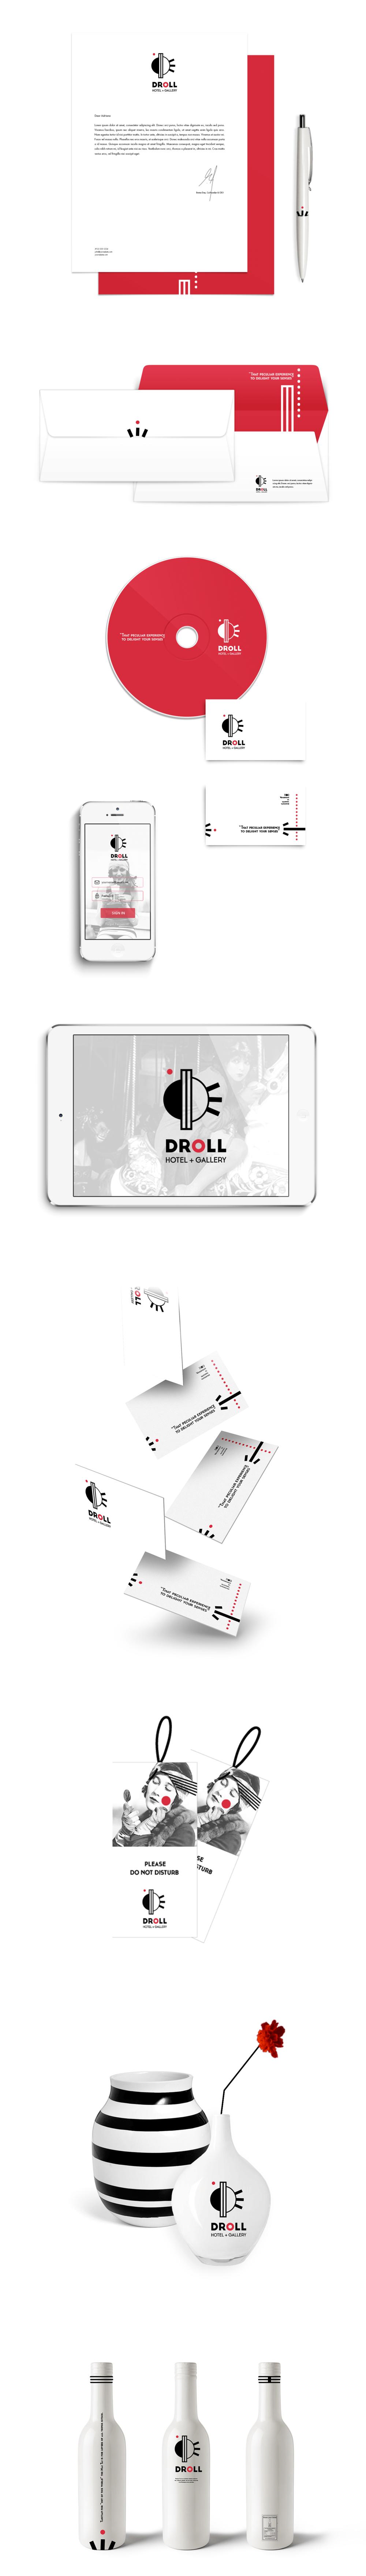 Droll_Aplications_PORTFOLIO_2.png